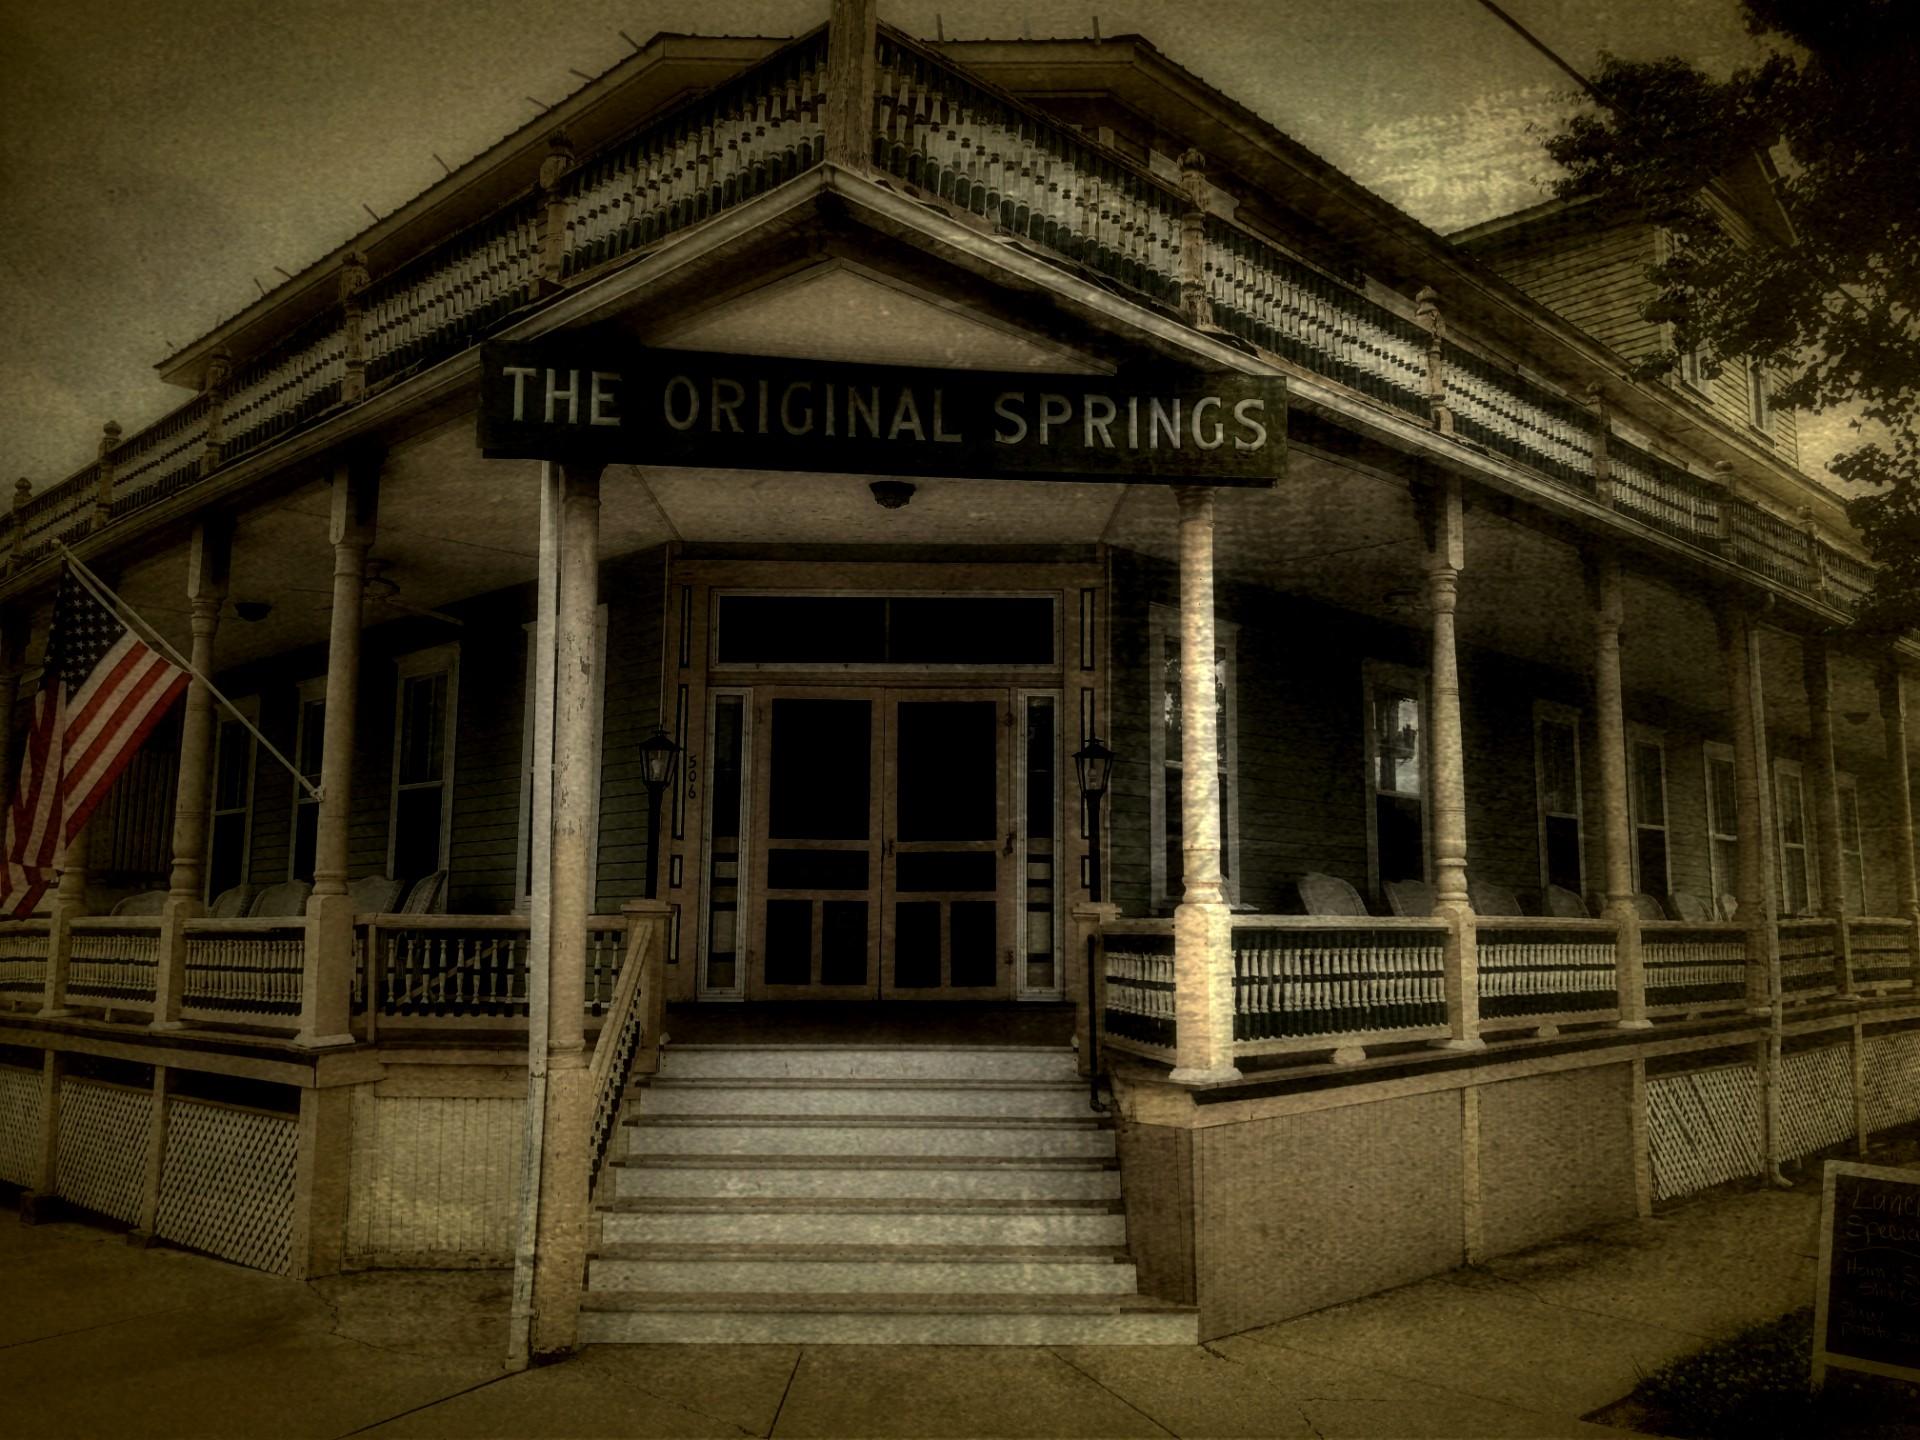 original springs 2019 (1).jpg